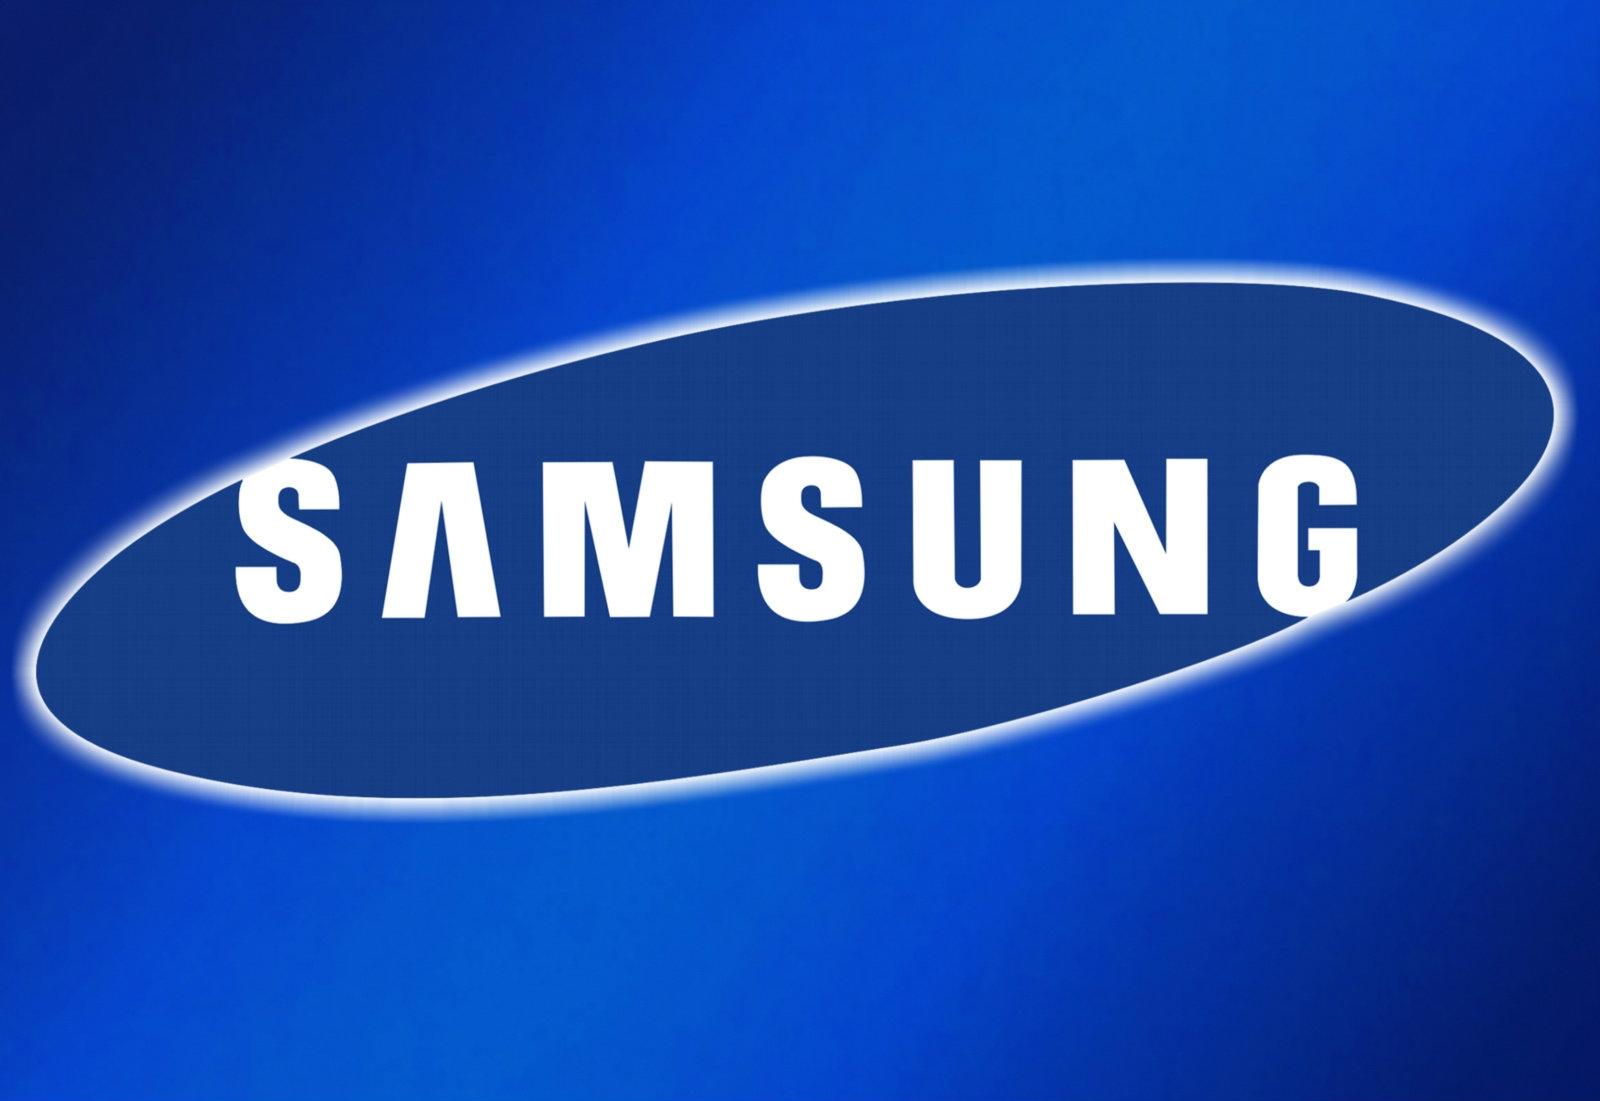 Anti Samsung Thailand เอาจริง เตรียมนัดรวมตัวกันวันที่ 8 สิงหาคมนี้ เพื่อเจรจากับผู้บริหารซัมซุง